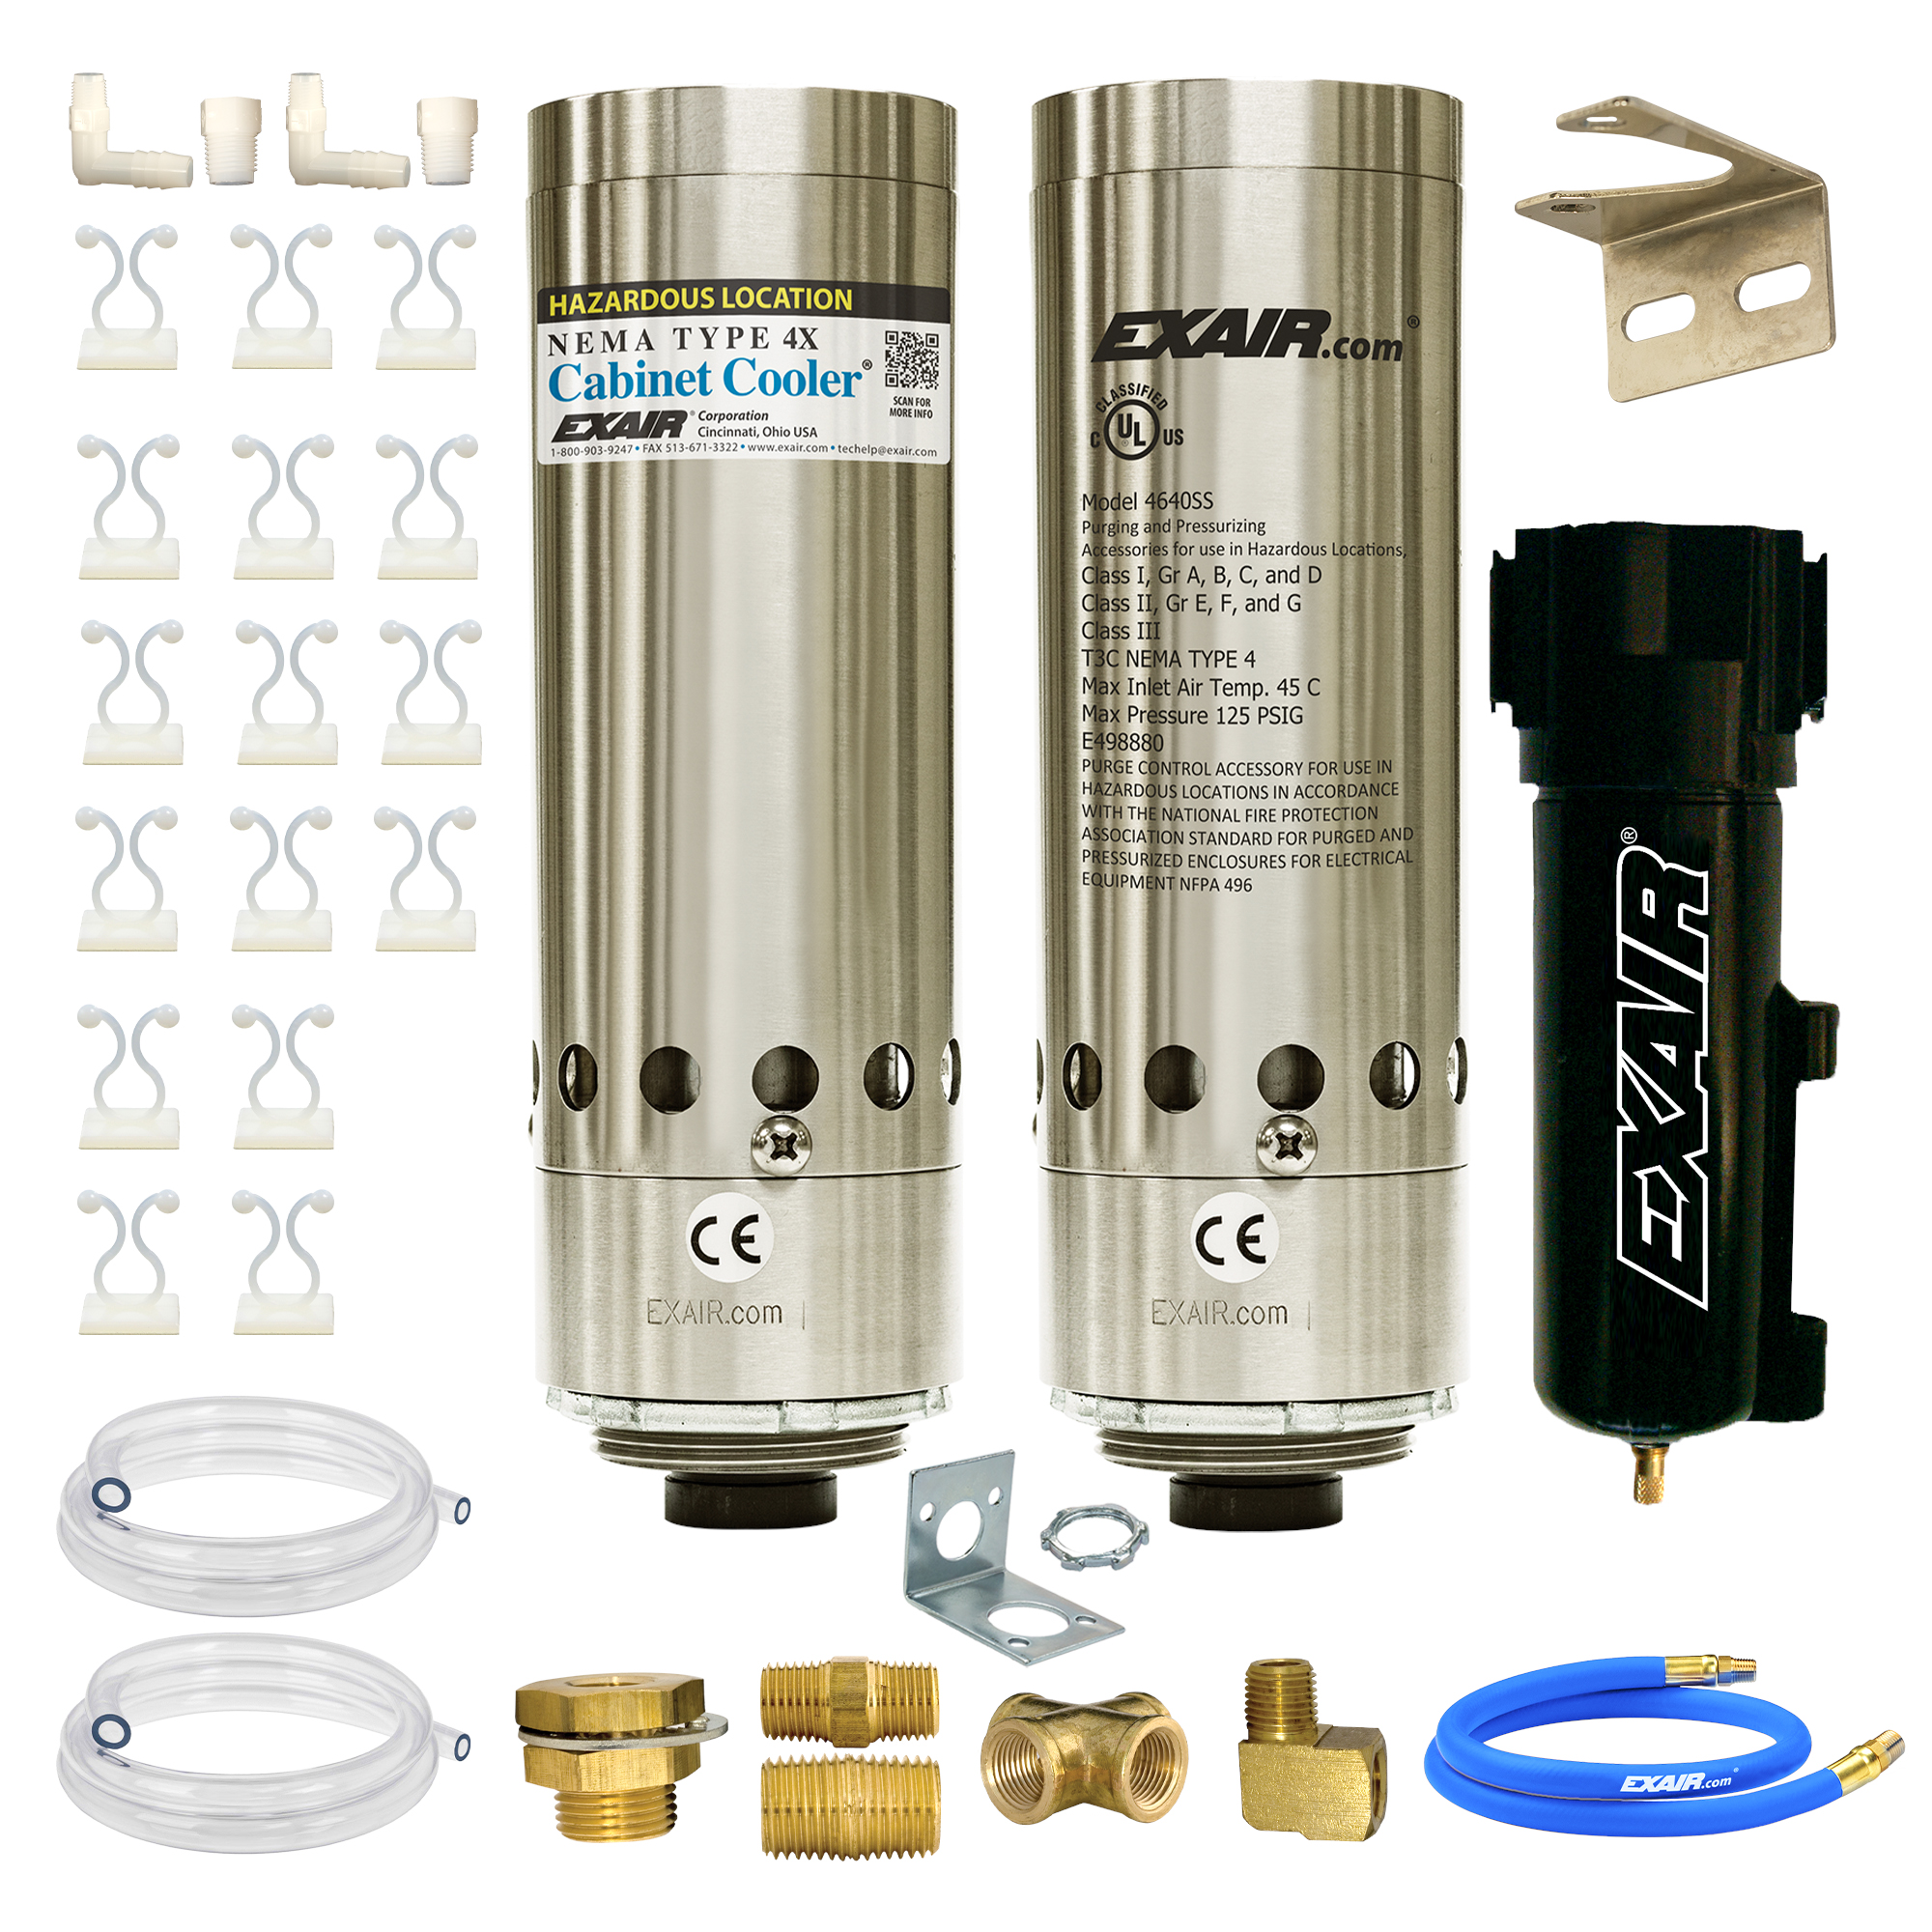 Model HZ4870 NEMA 4 4,800 Btu/hr HazLoc Cabinet Cooler w Therm